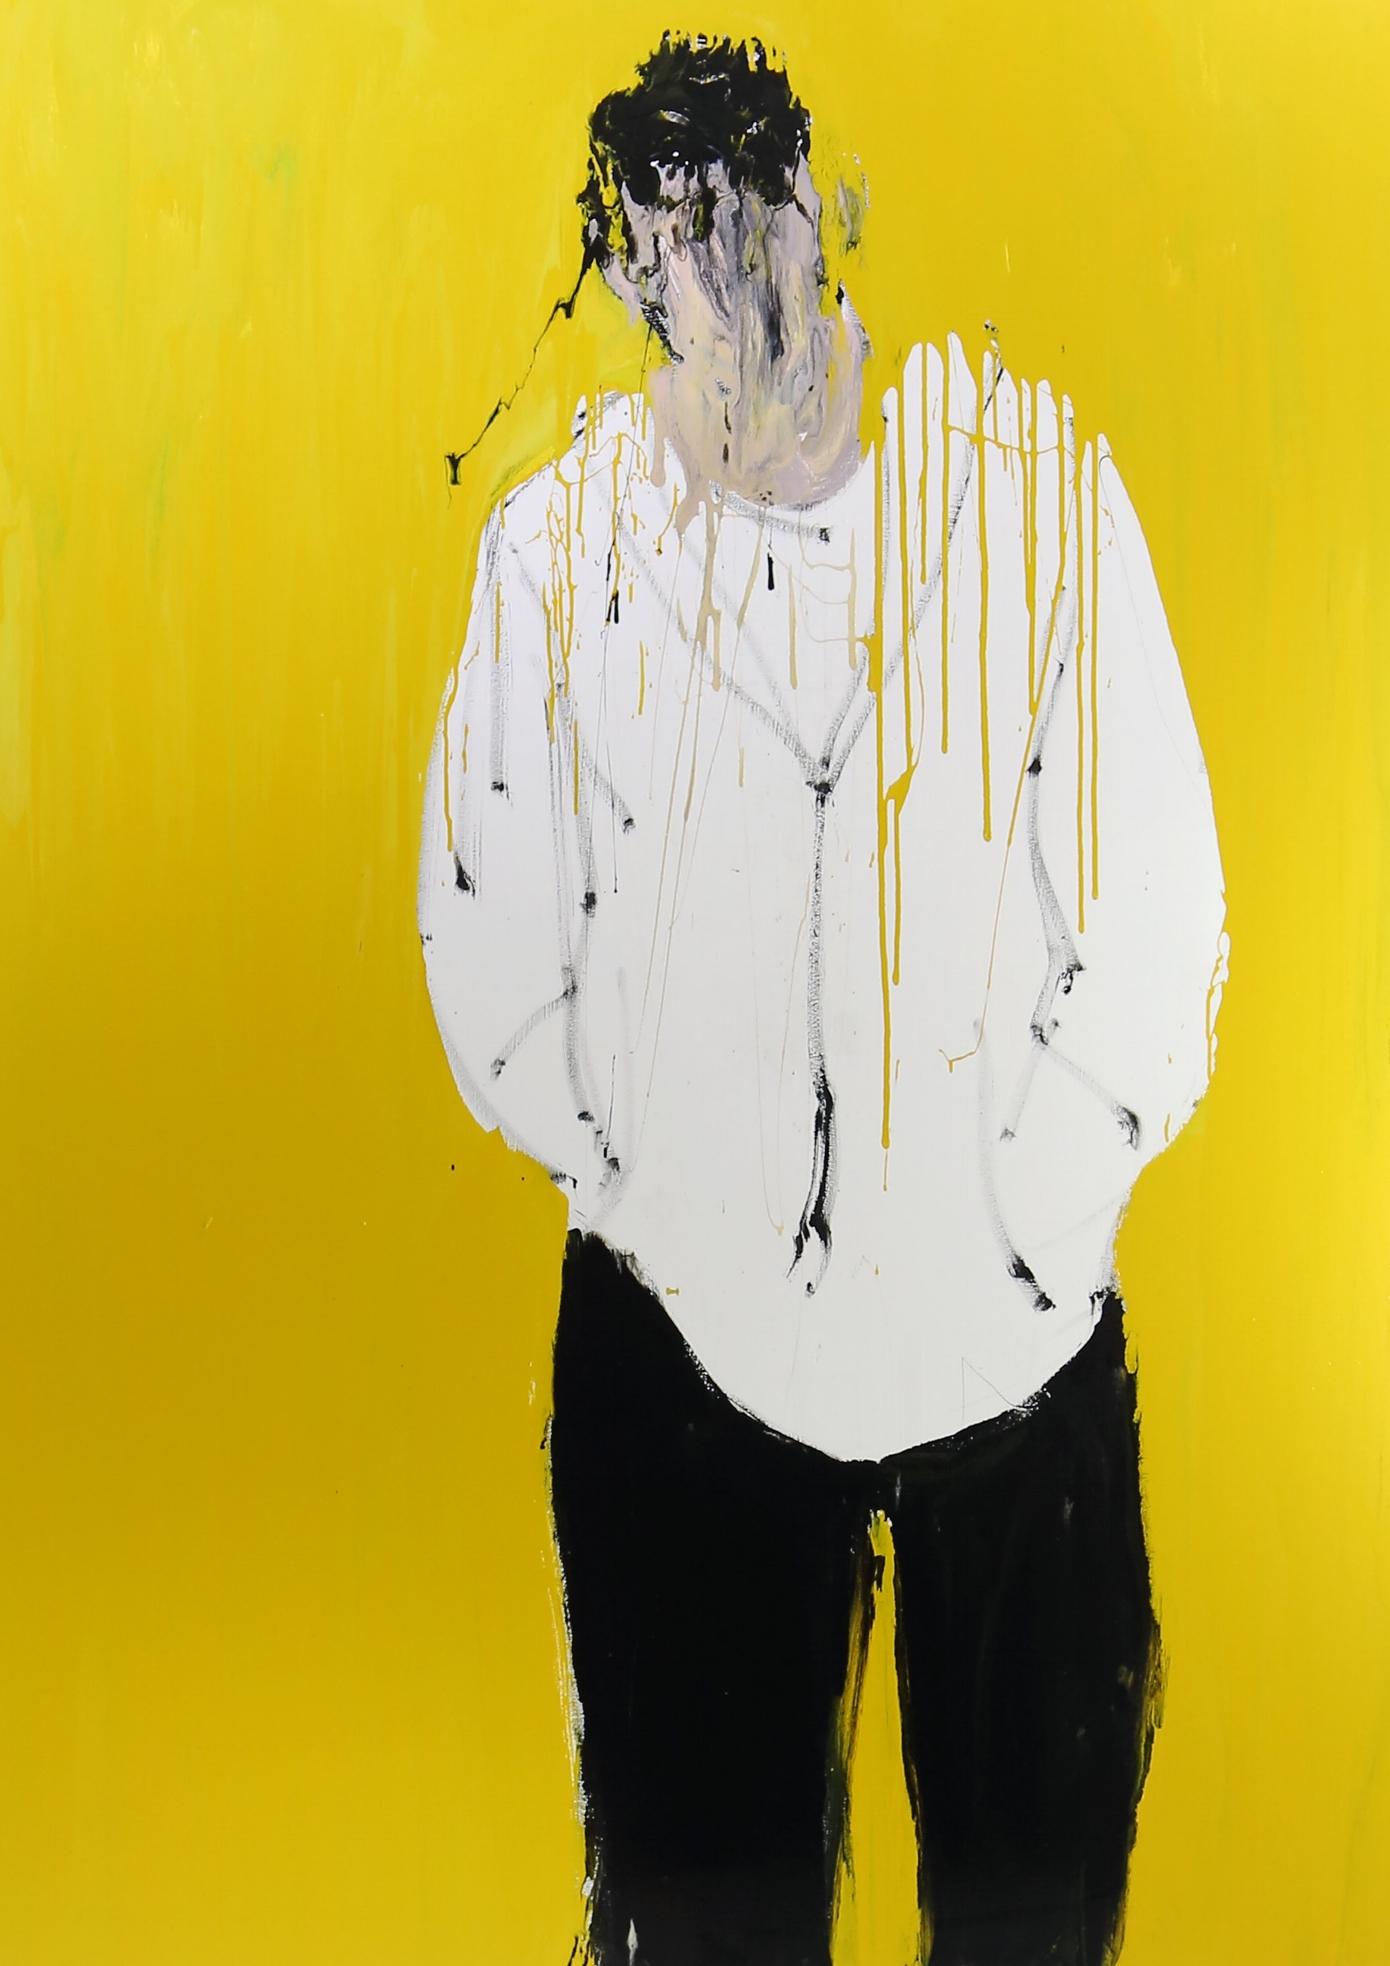 Muneeb, 2016, enamel paint on canvas, 243 x 168 cm